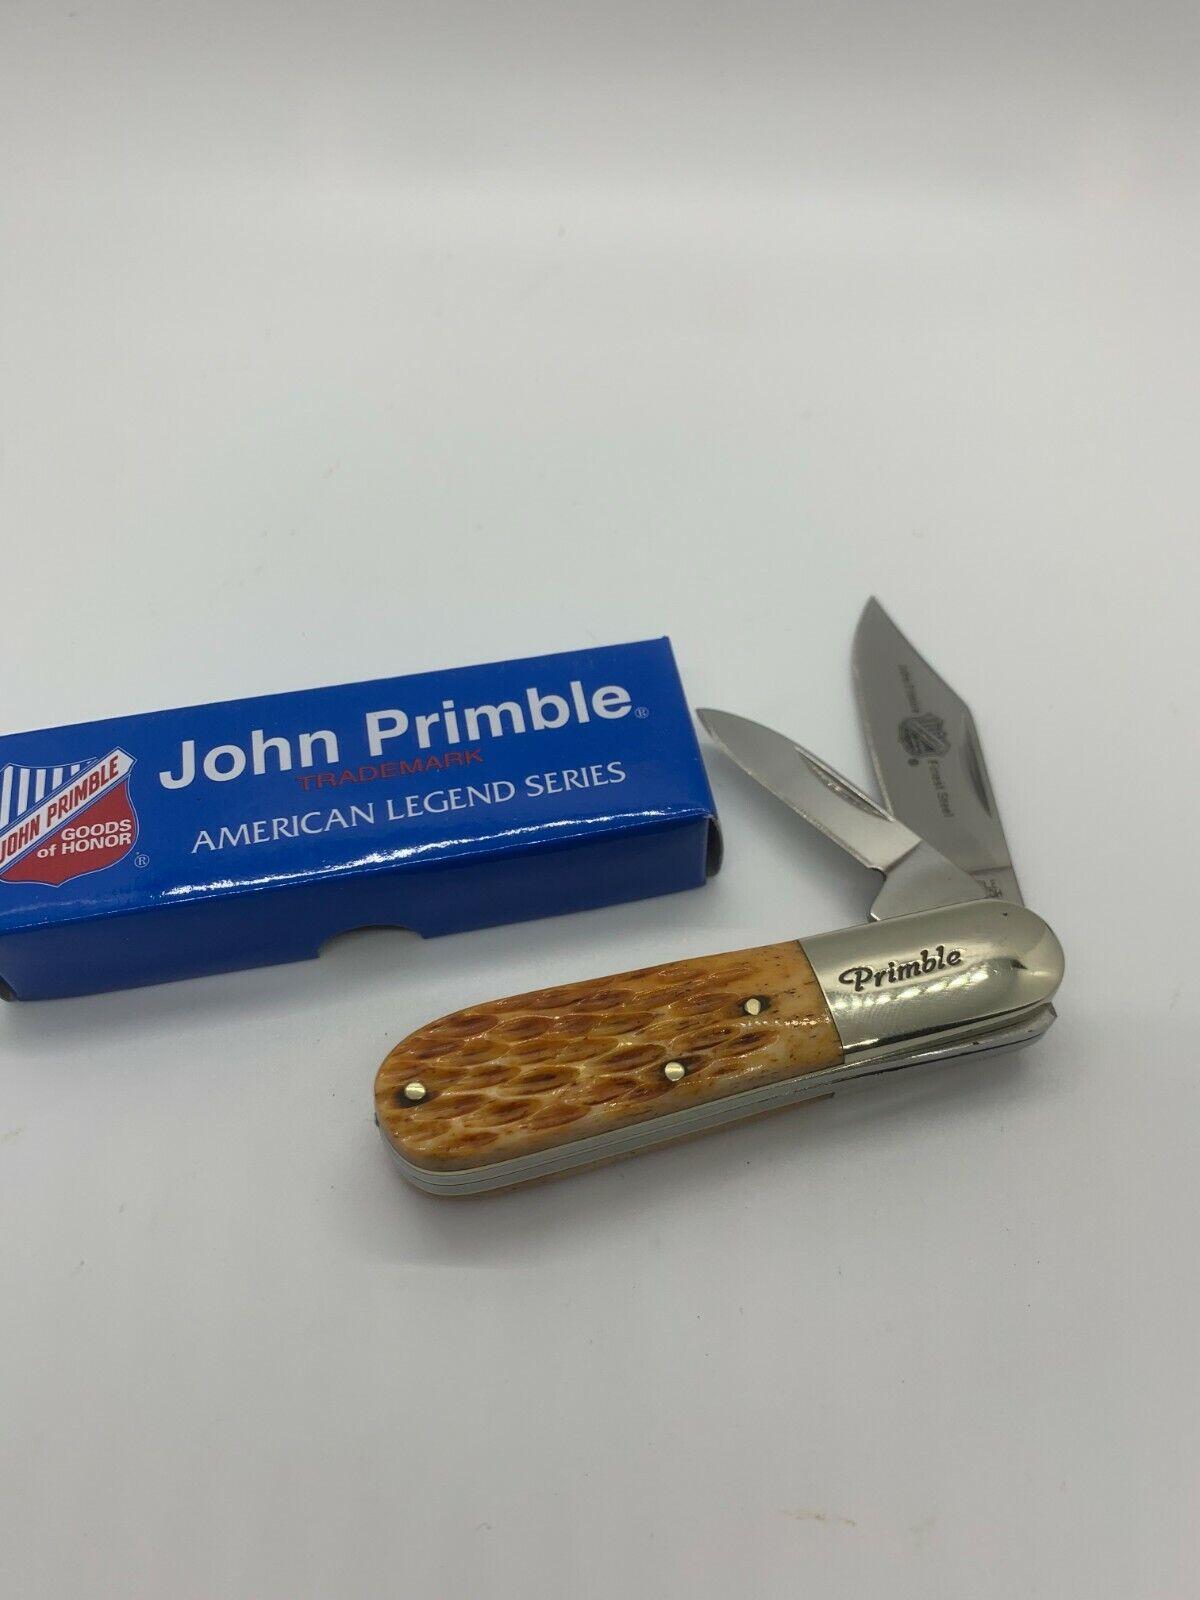 JOHN PRIMBLE 2-BLADED BARLOW KNIFE - GREEN JIGGED BONE - JP 30 0020JGB - NIB